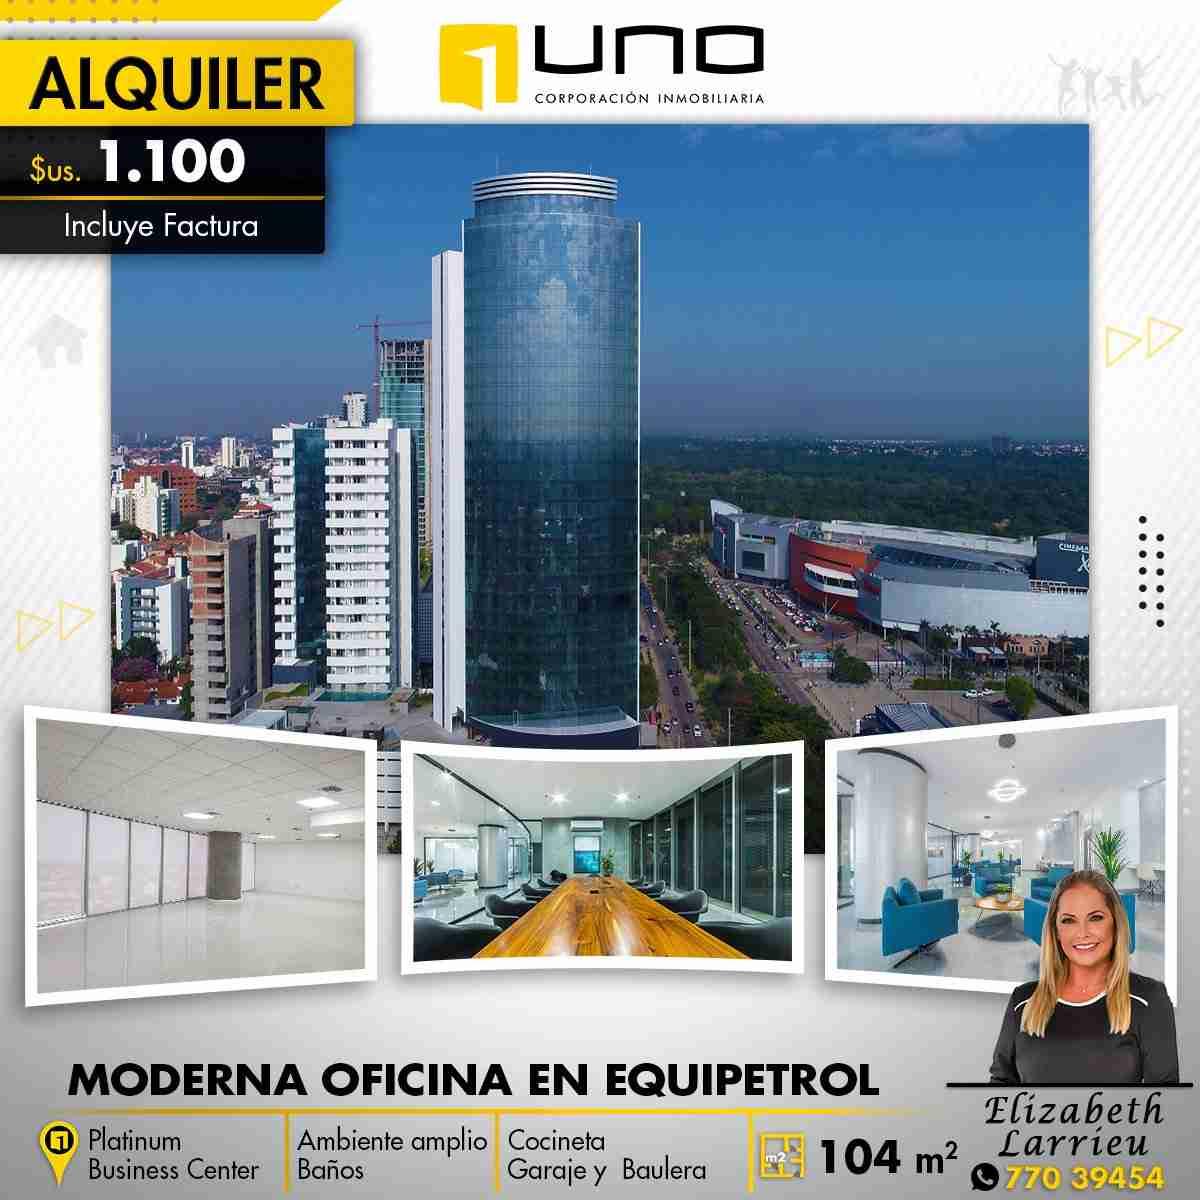 MODERNA Y LUJOSA OFICINA EN EQUIPETROL PLATINUM BUSINESS CENTER